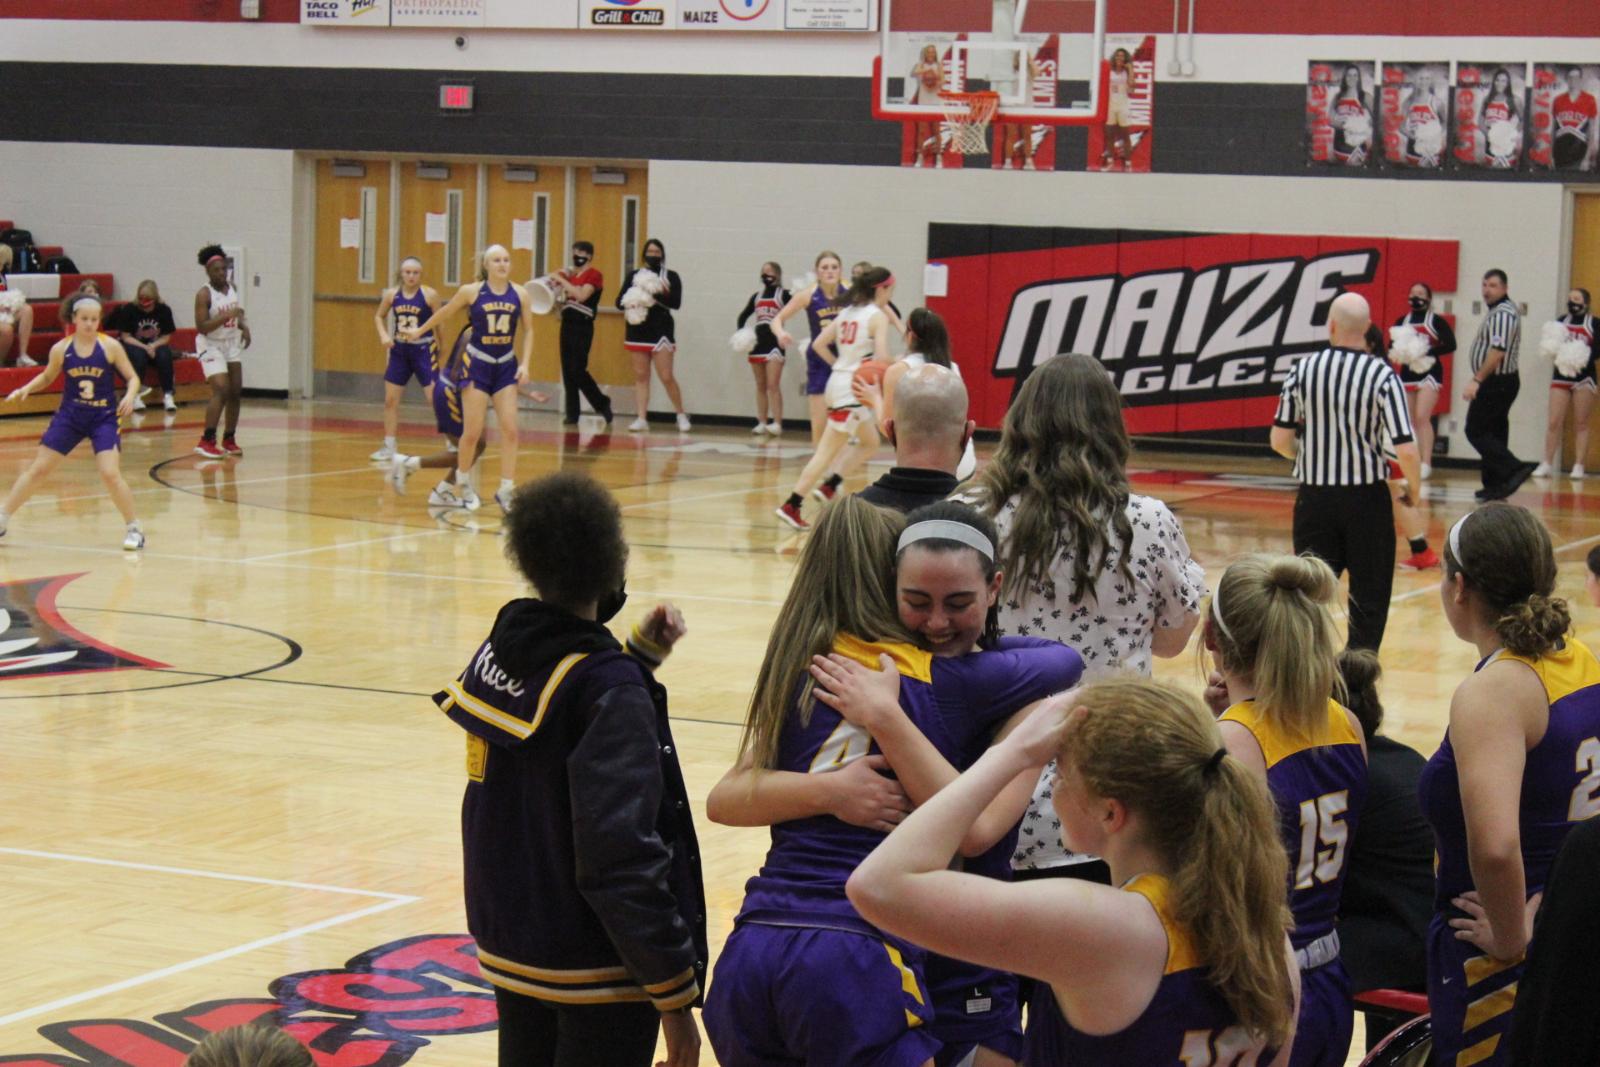 Girls Basketball Post Season in Goddard and Maize